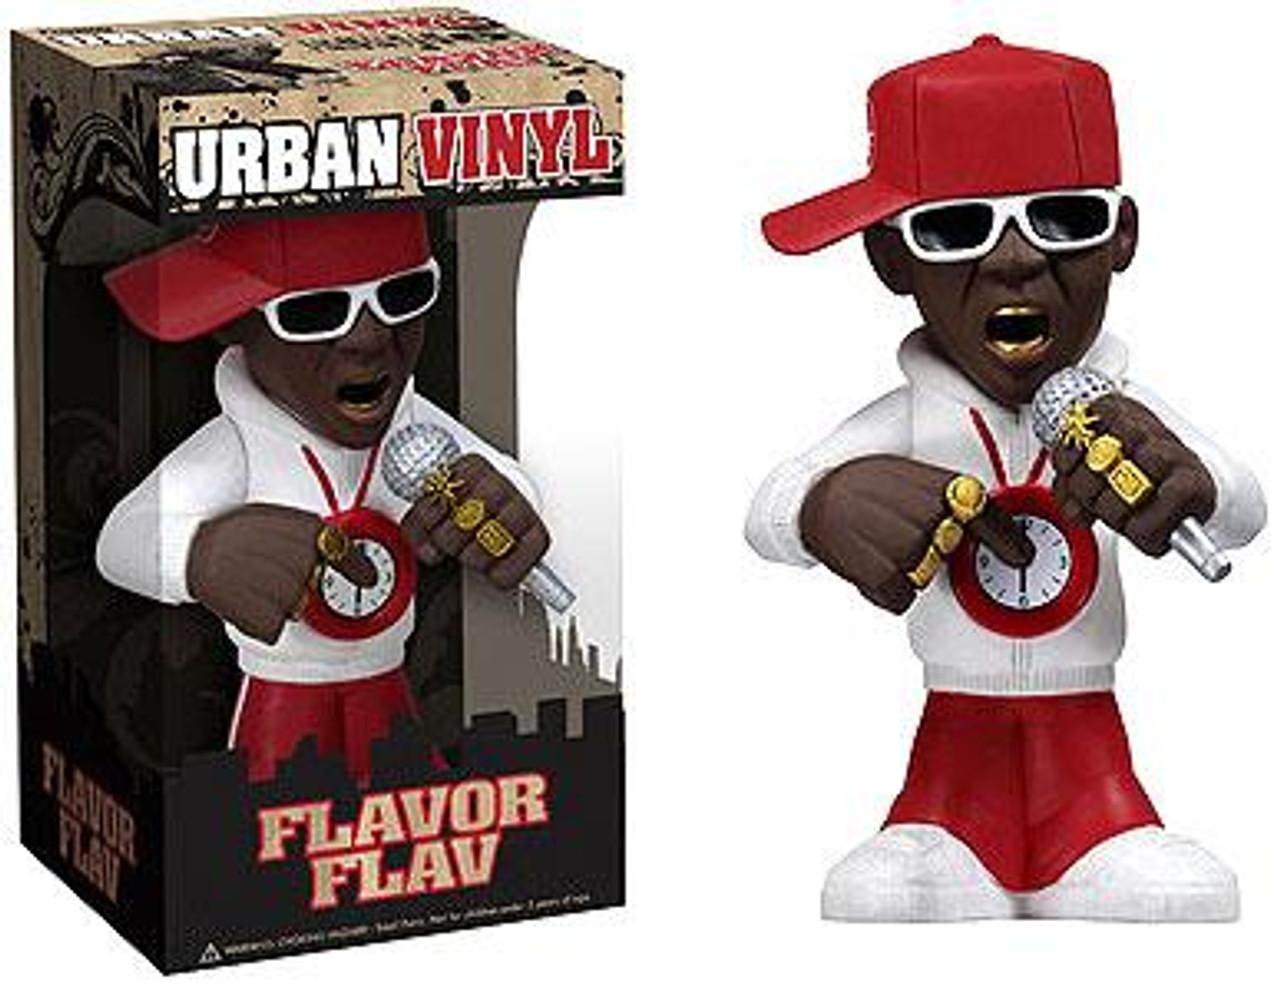 Public Enemy Funko Rocks Urban Vinyl Flavor Flav 6-Inch Vinyl Figure [Public Enemy]